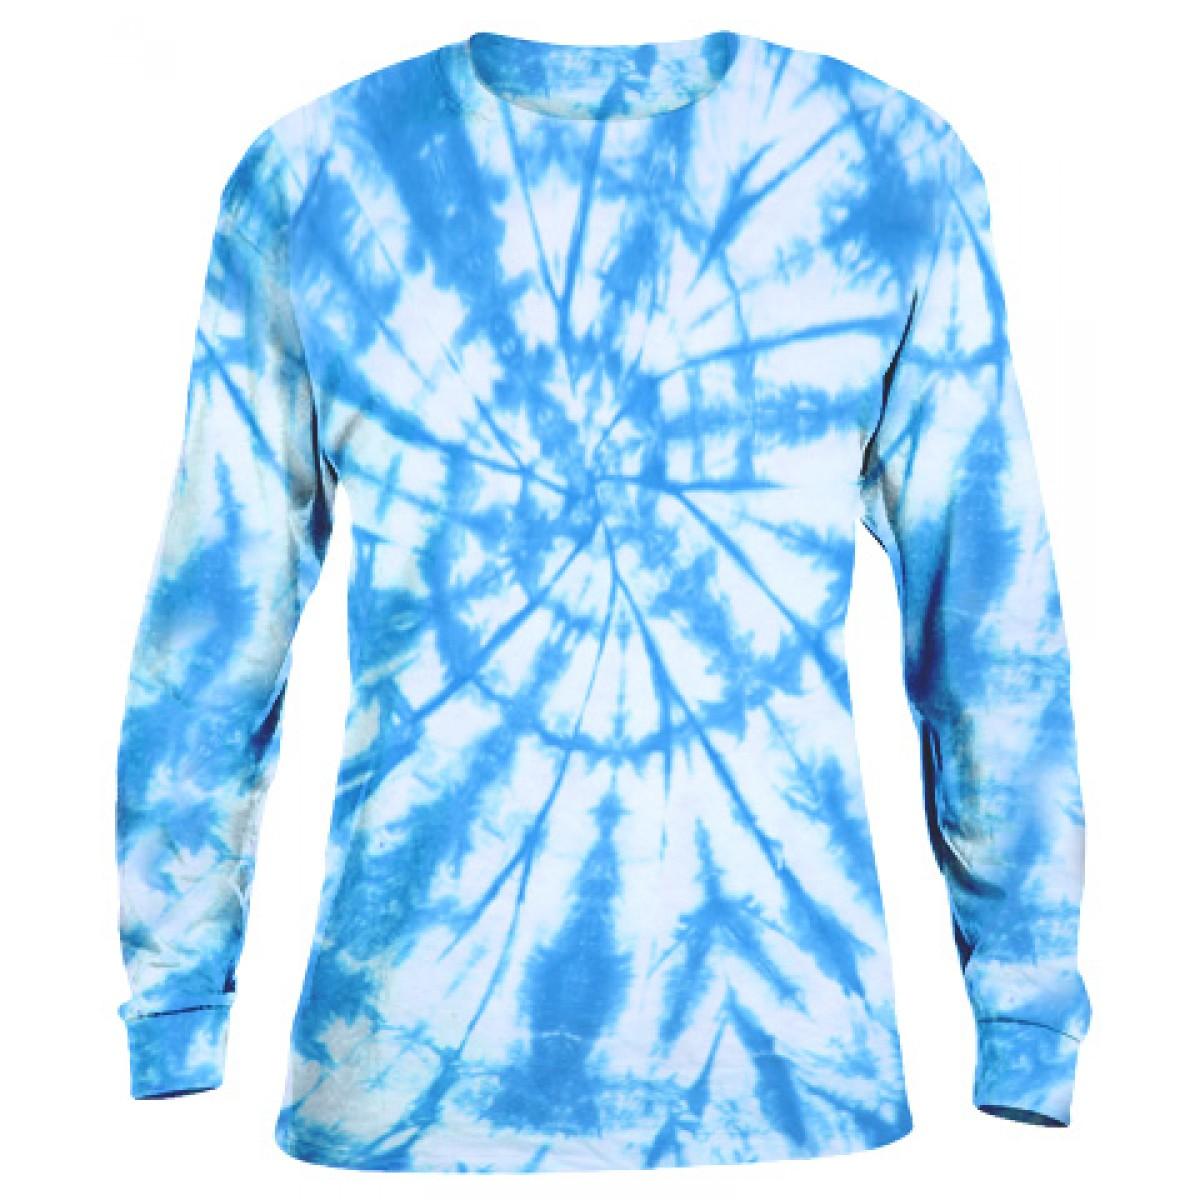 Tie-Dye Long Sleeve Shirt -Blue-YM